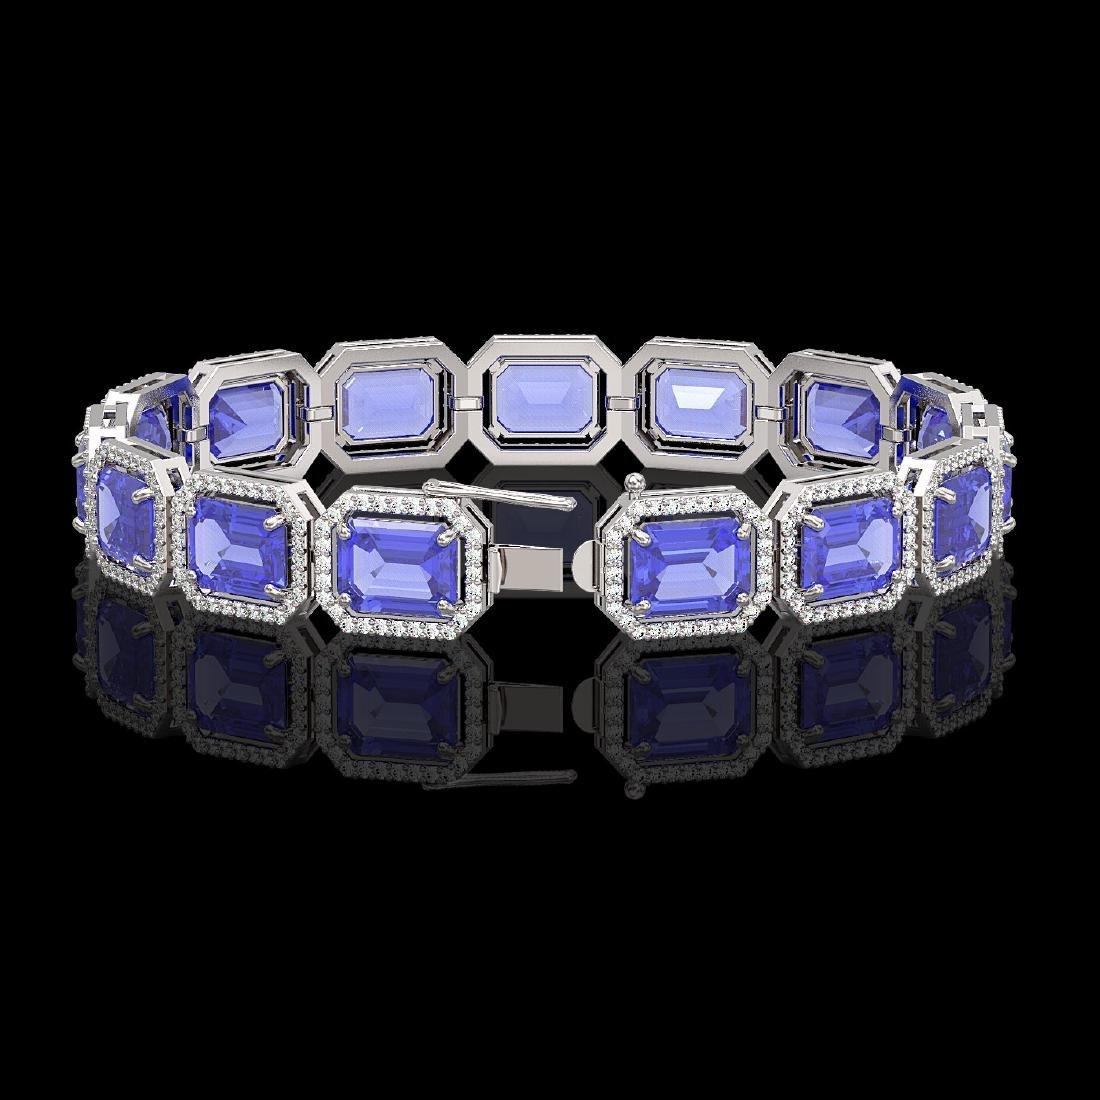 36.37 CTW Tanzanite & Diamond Halo Bracelet 10K White - 2